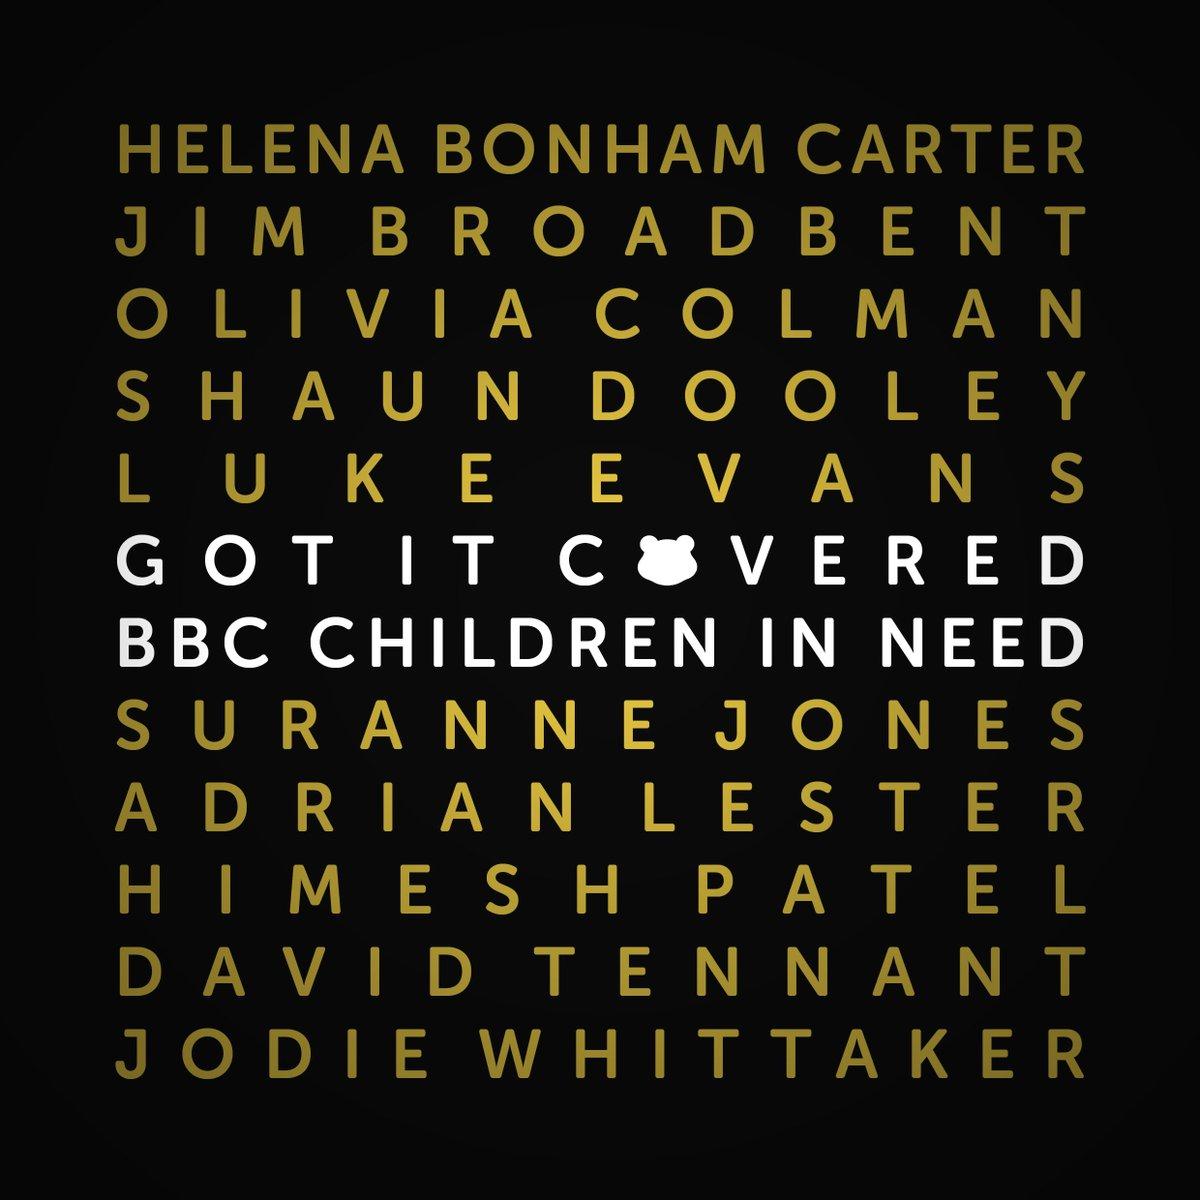 23222a6581b BBC Children in Need (@BBCCiN) | Twitter